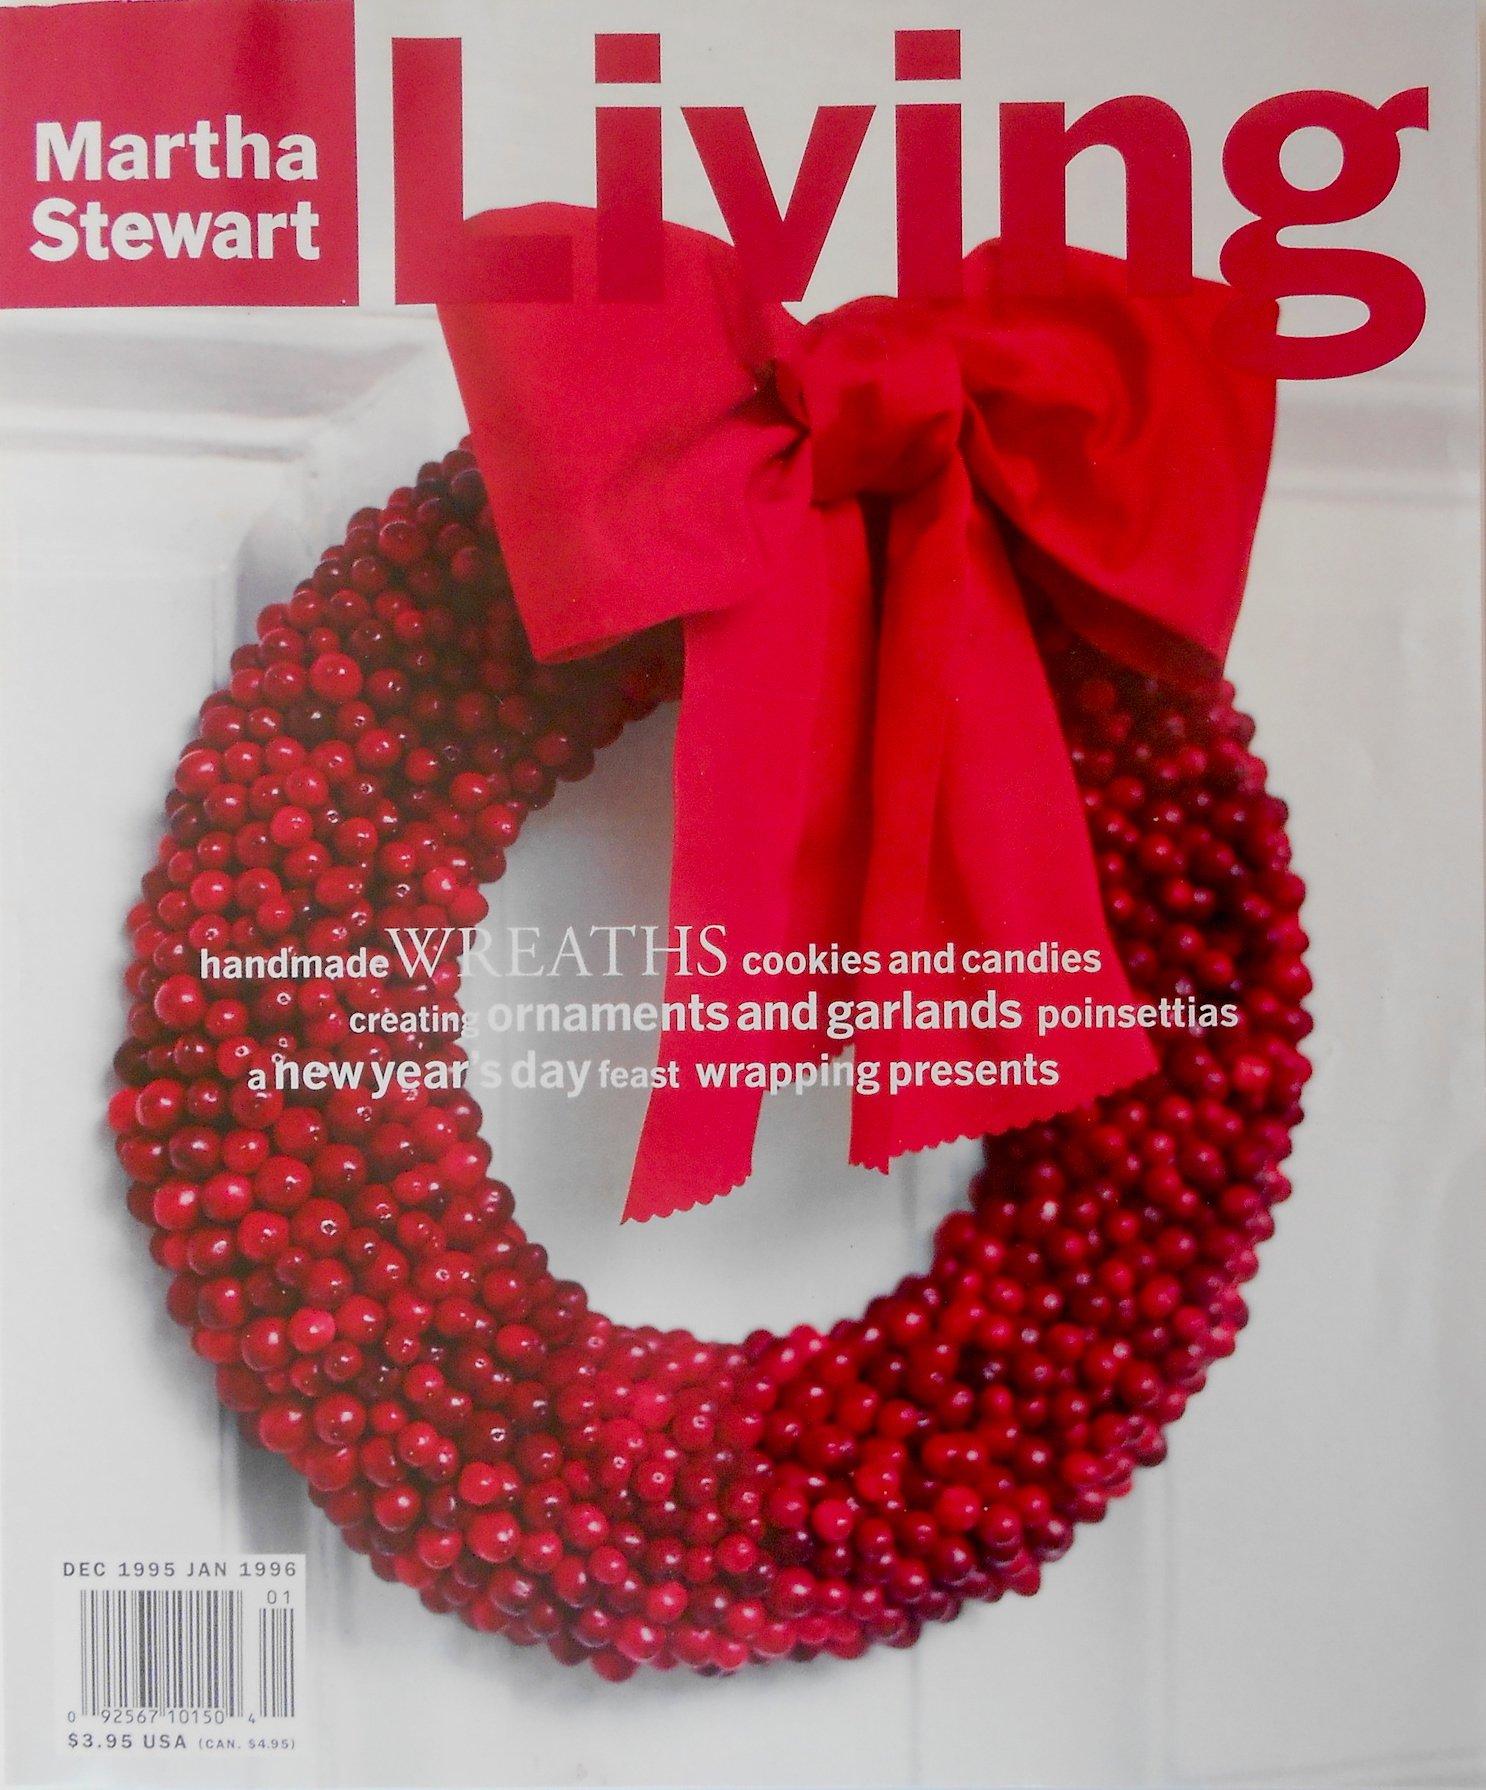 Martha Stewart Living Magazine Dec 1995 Jan 1996 Amazon Com Books